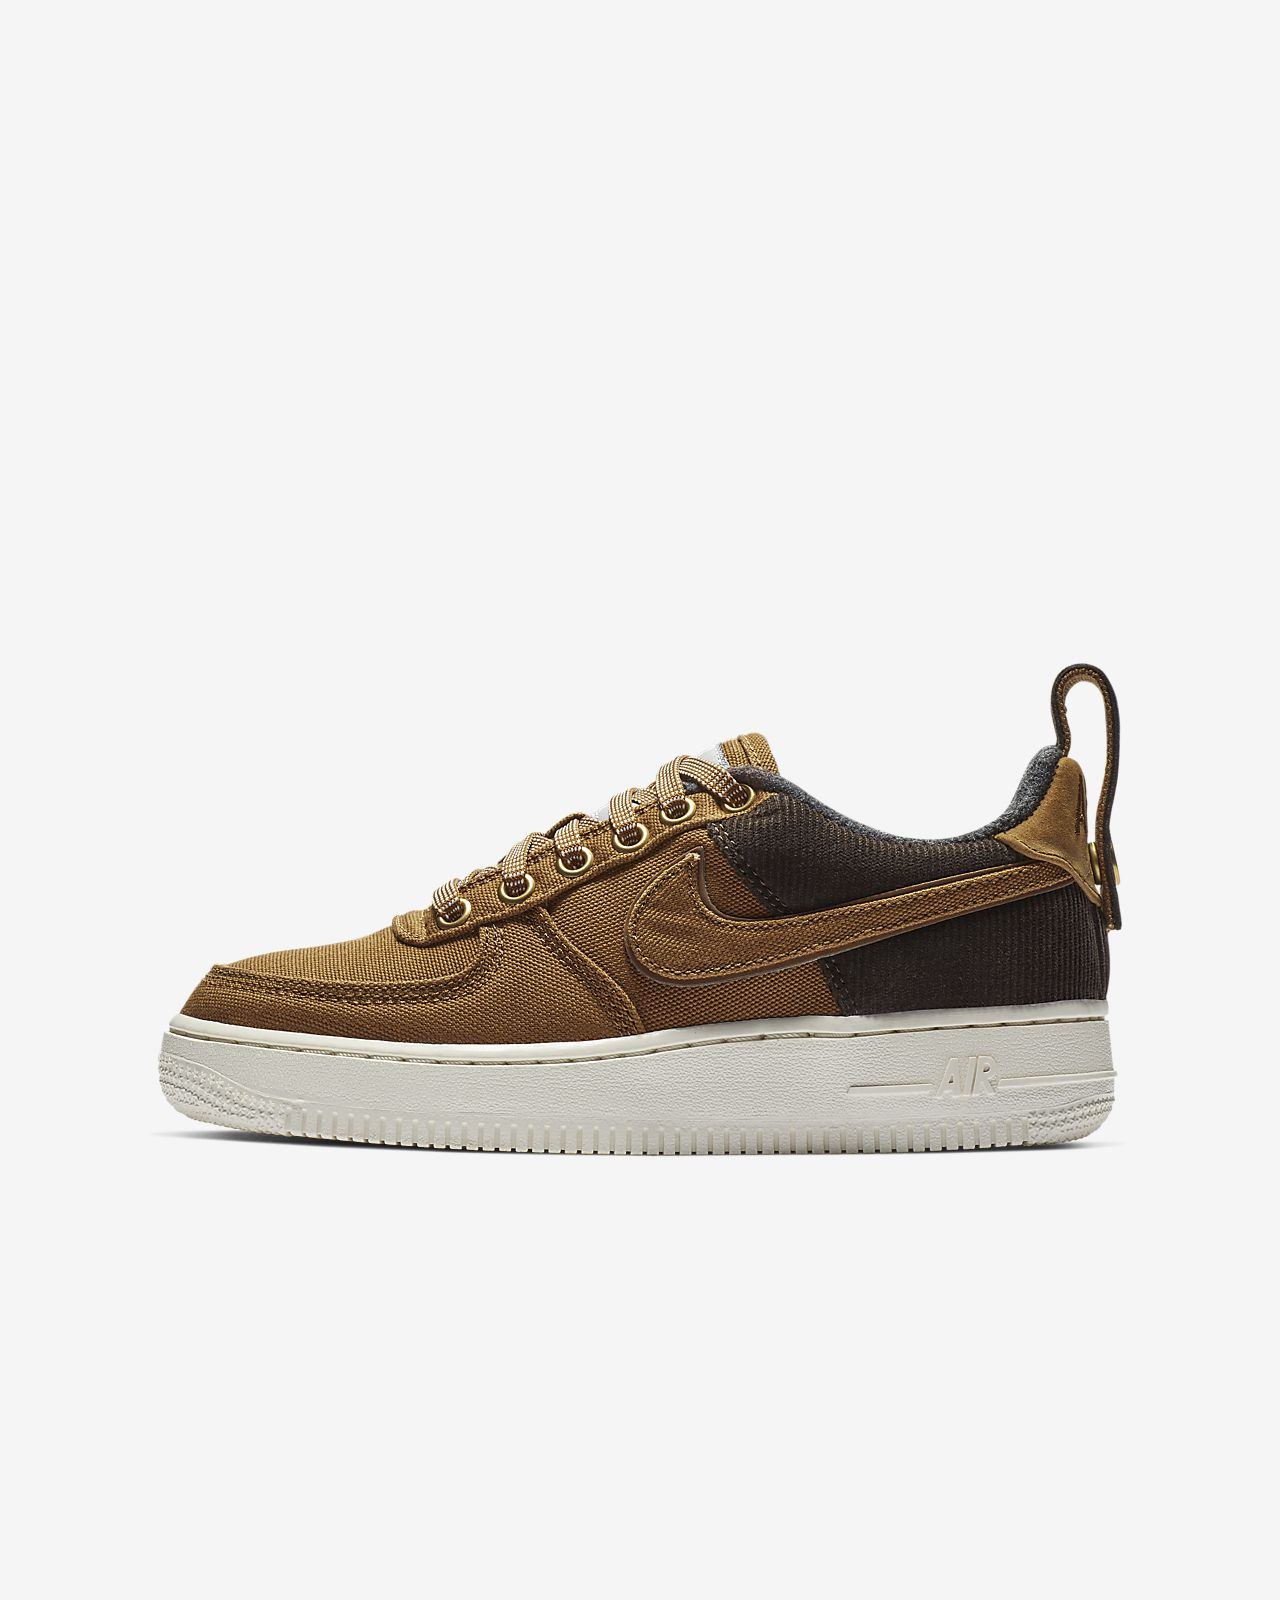 hot sale online 36f7a 6d536 Nike Air Force 1 Premium WIP